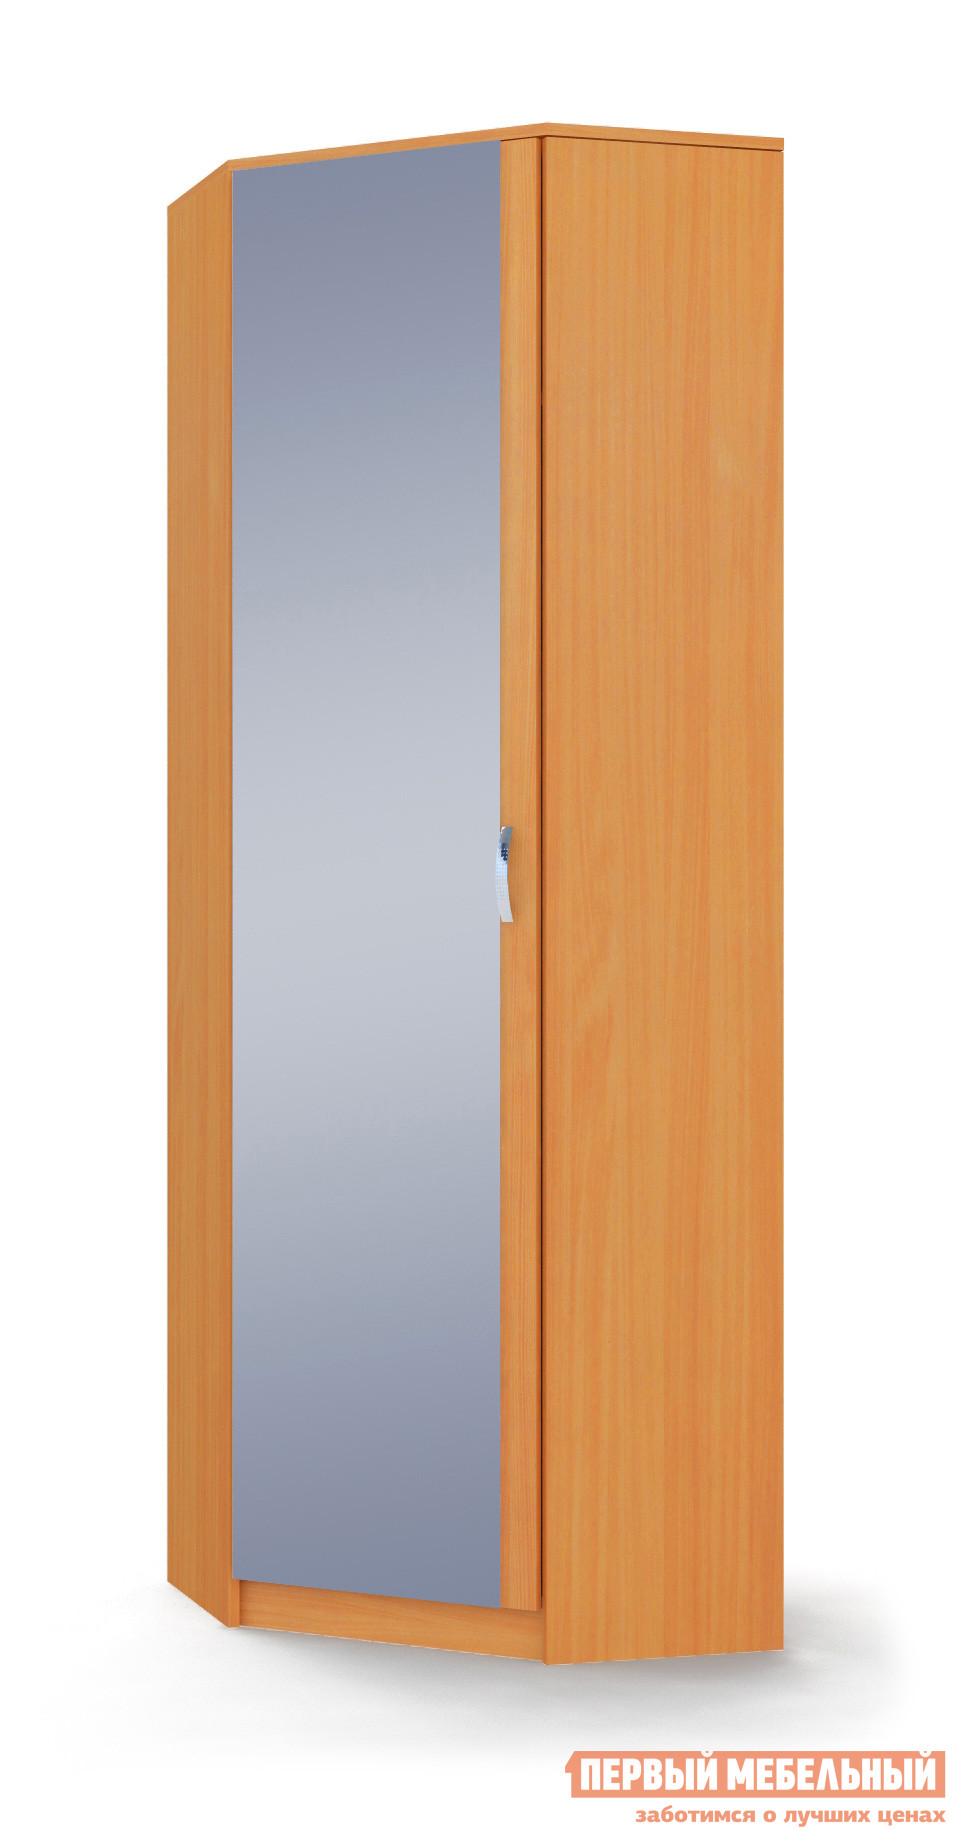 Шкаф распашной мф мастер шкаф угловой с зеркалом (шуз).